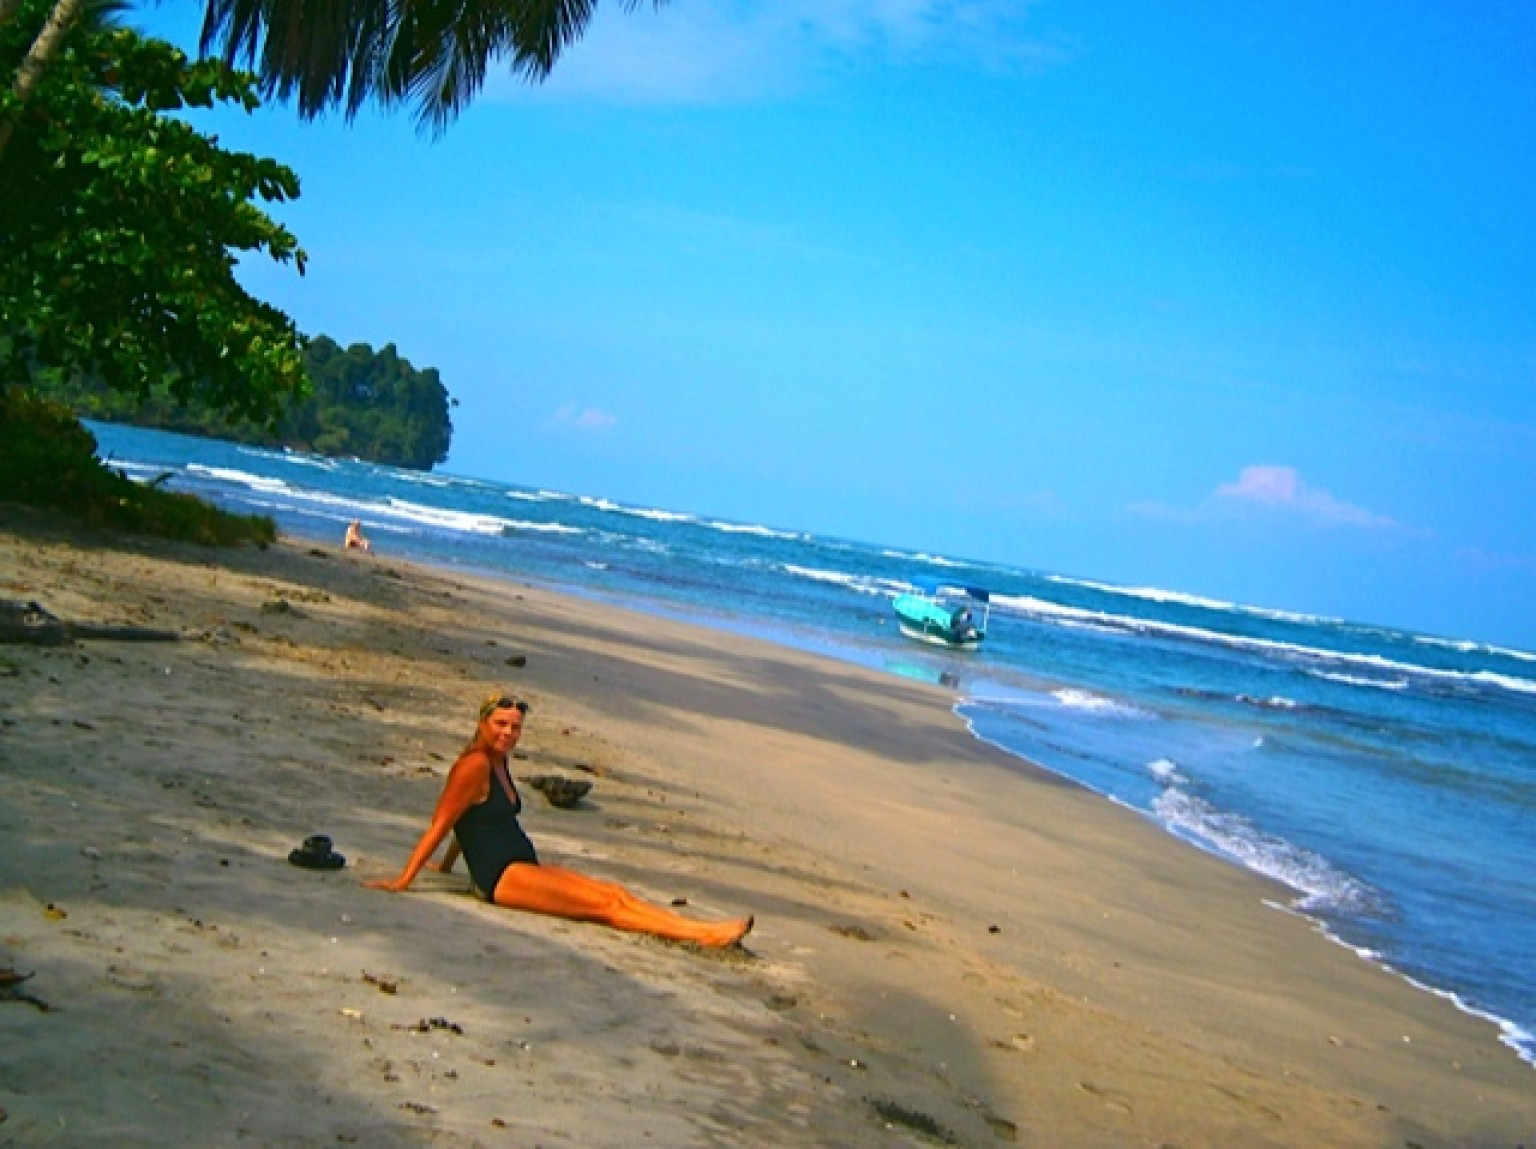 nudist images costarica